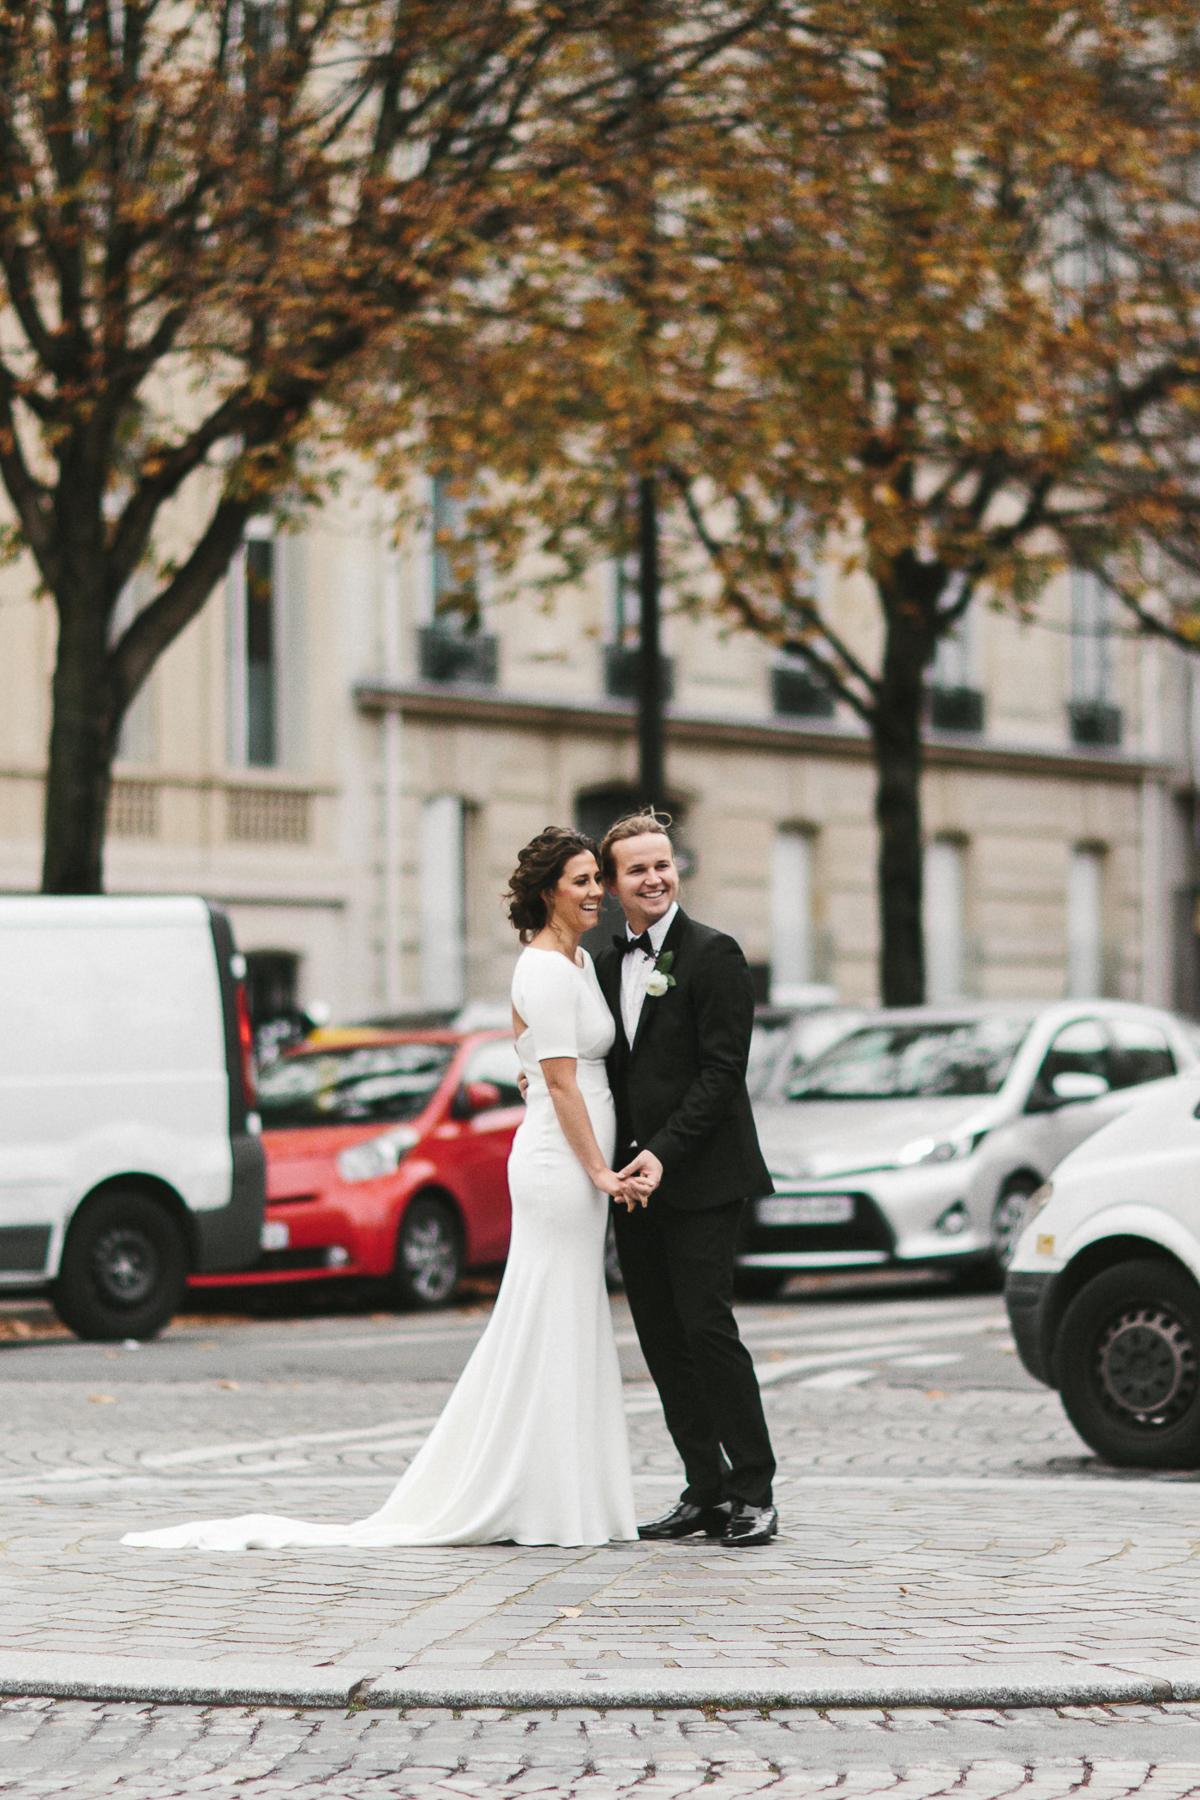 Paris Wedding Photographer Someplace Wild-104.jpg